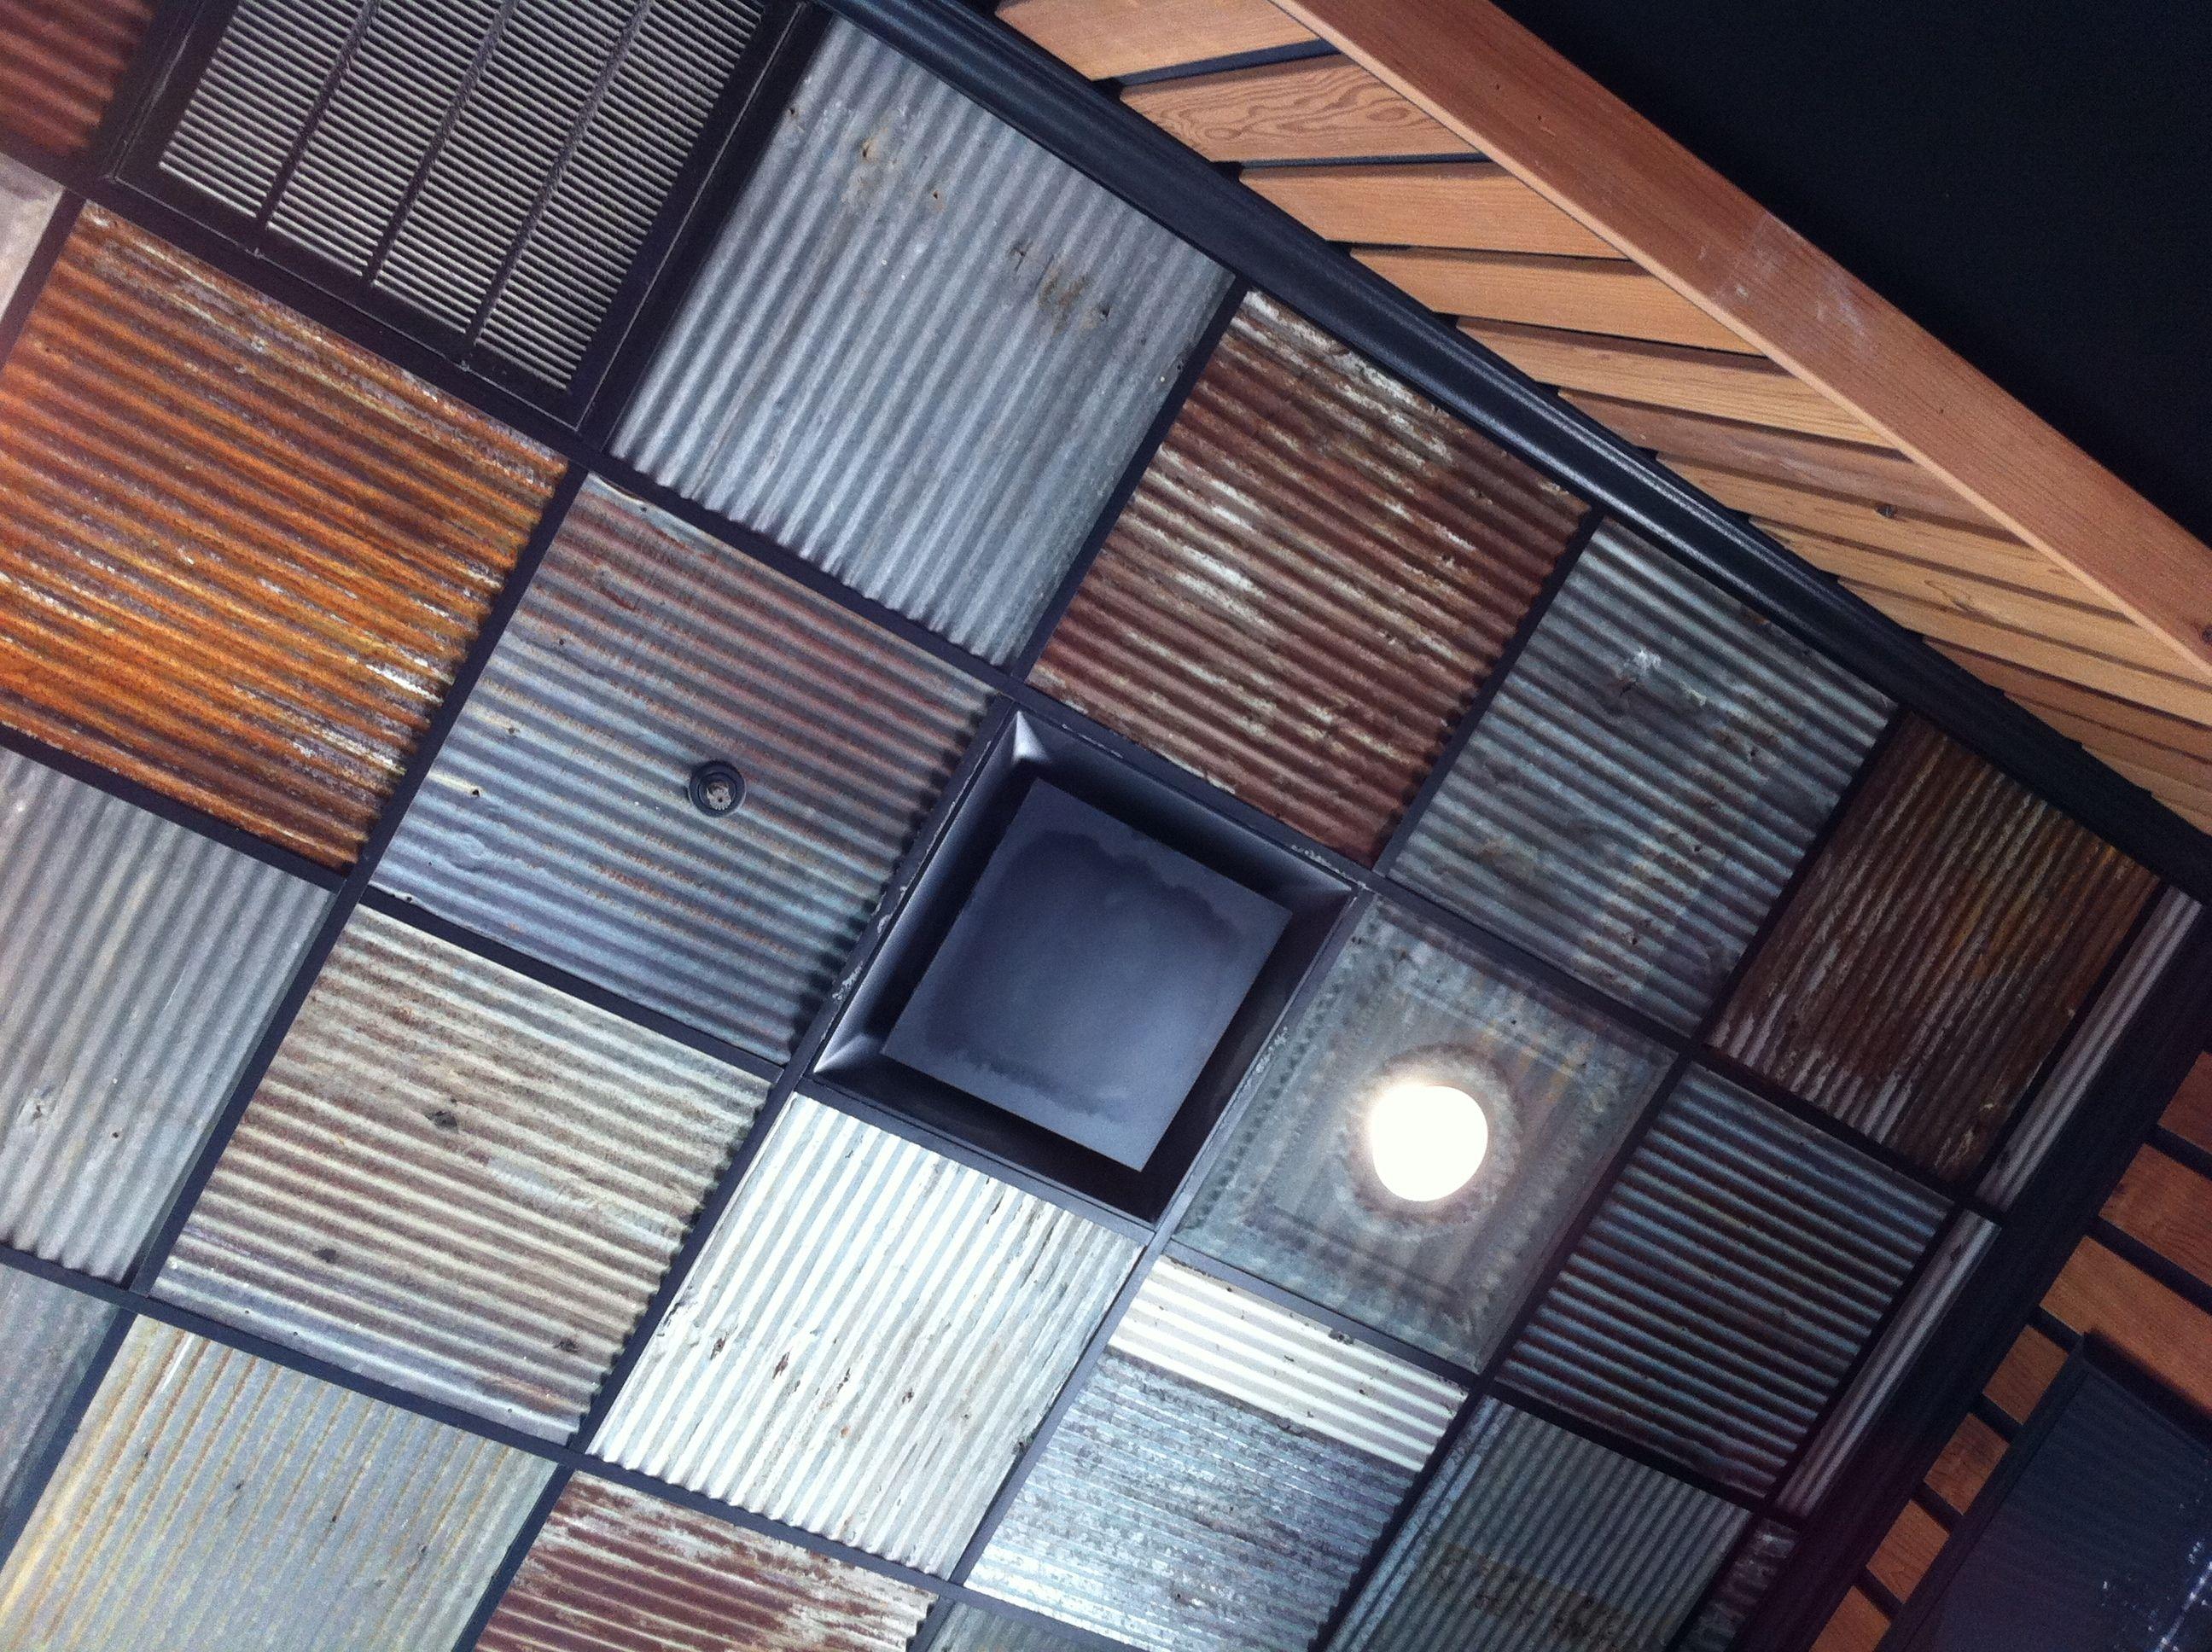 Rustic drop ceiling tiles httpcreativechairsandtables rustic drop ceiling tiles dailygadgetfo Images